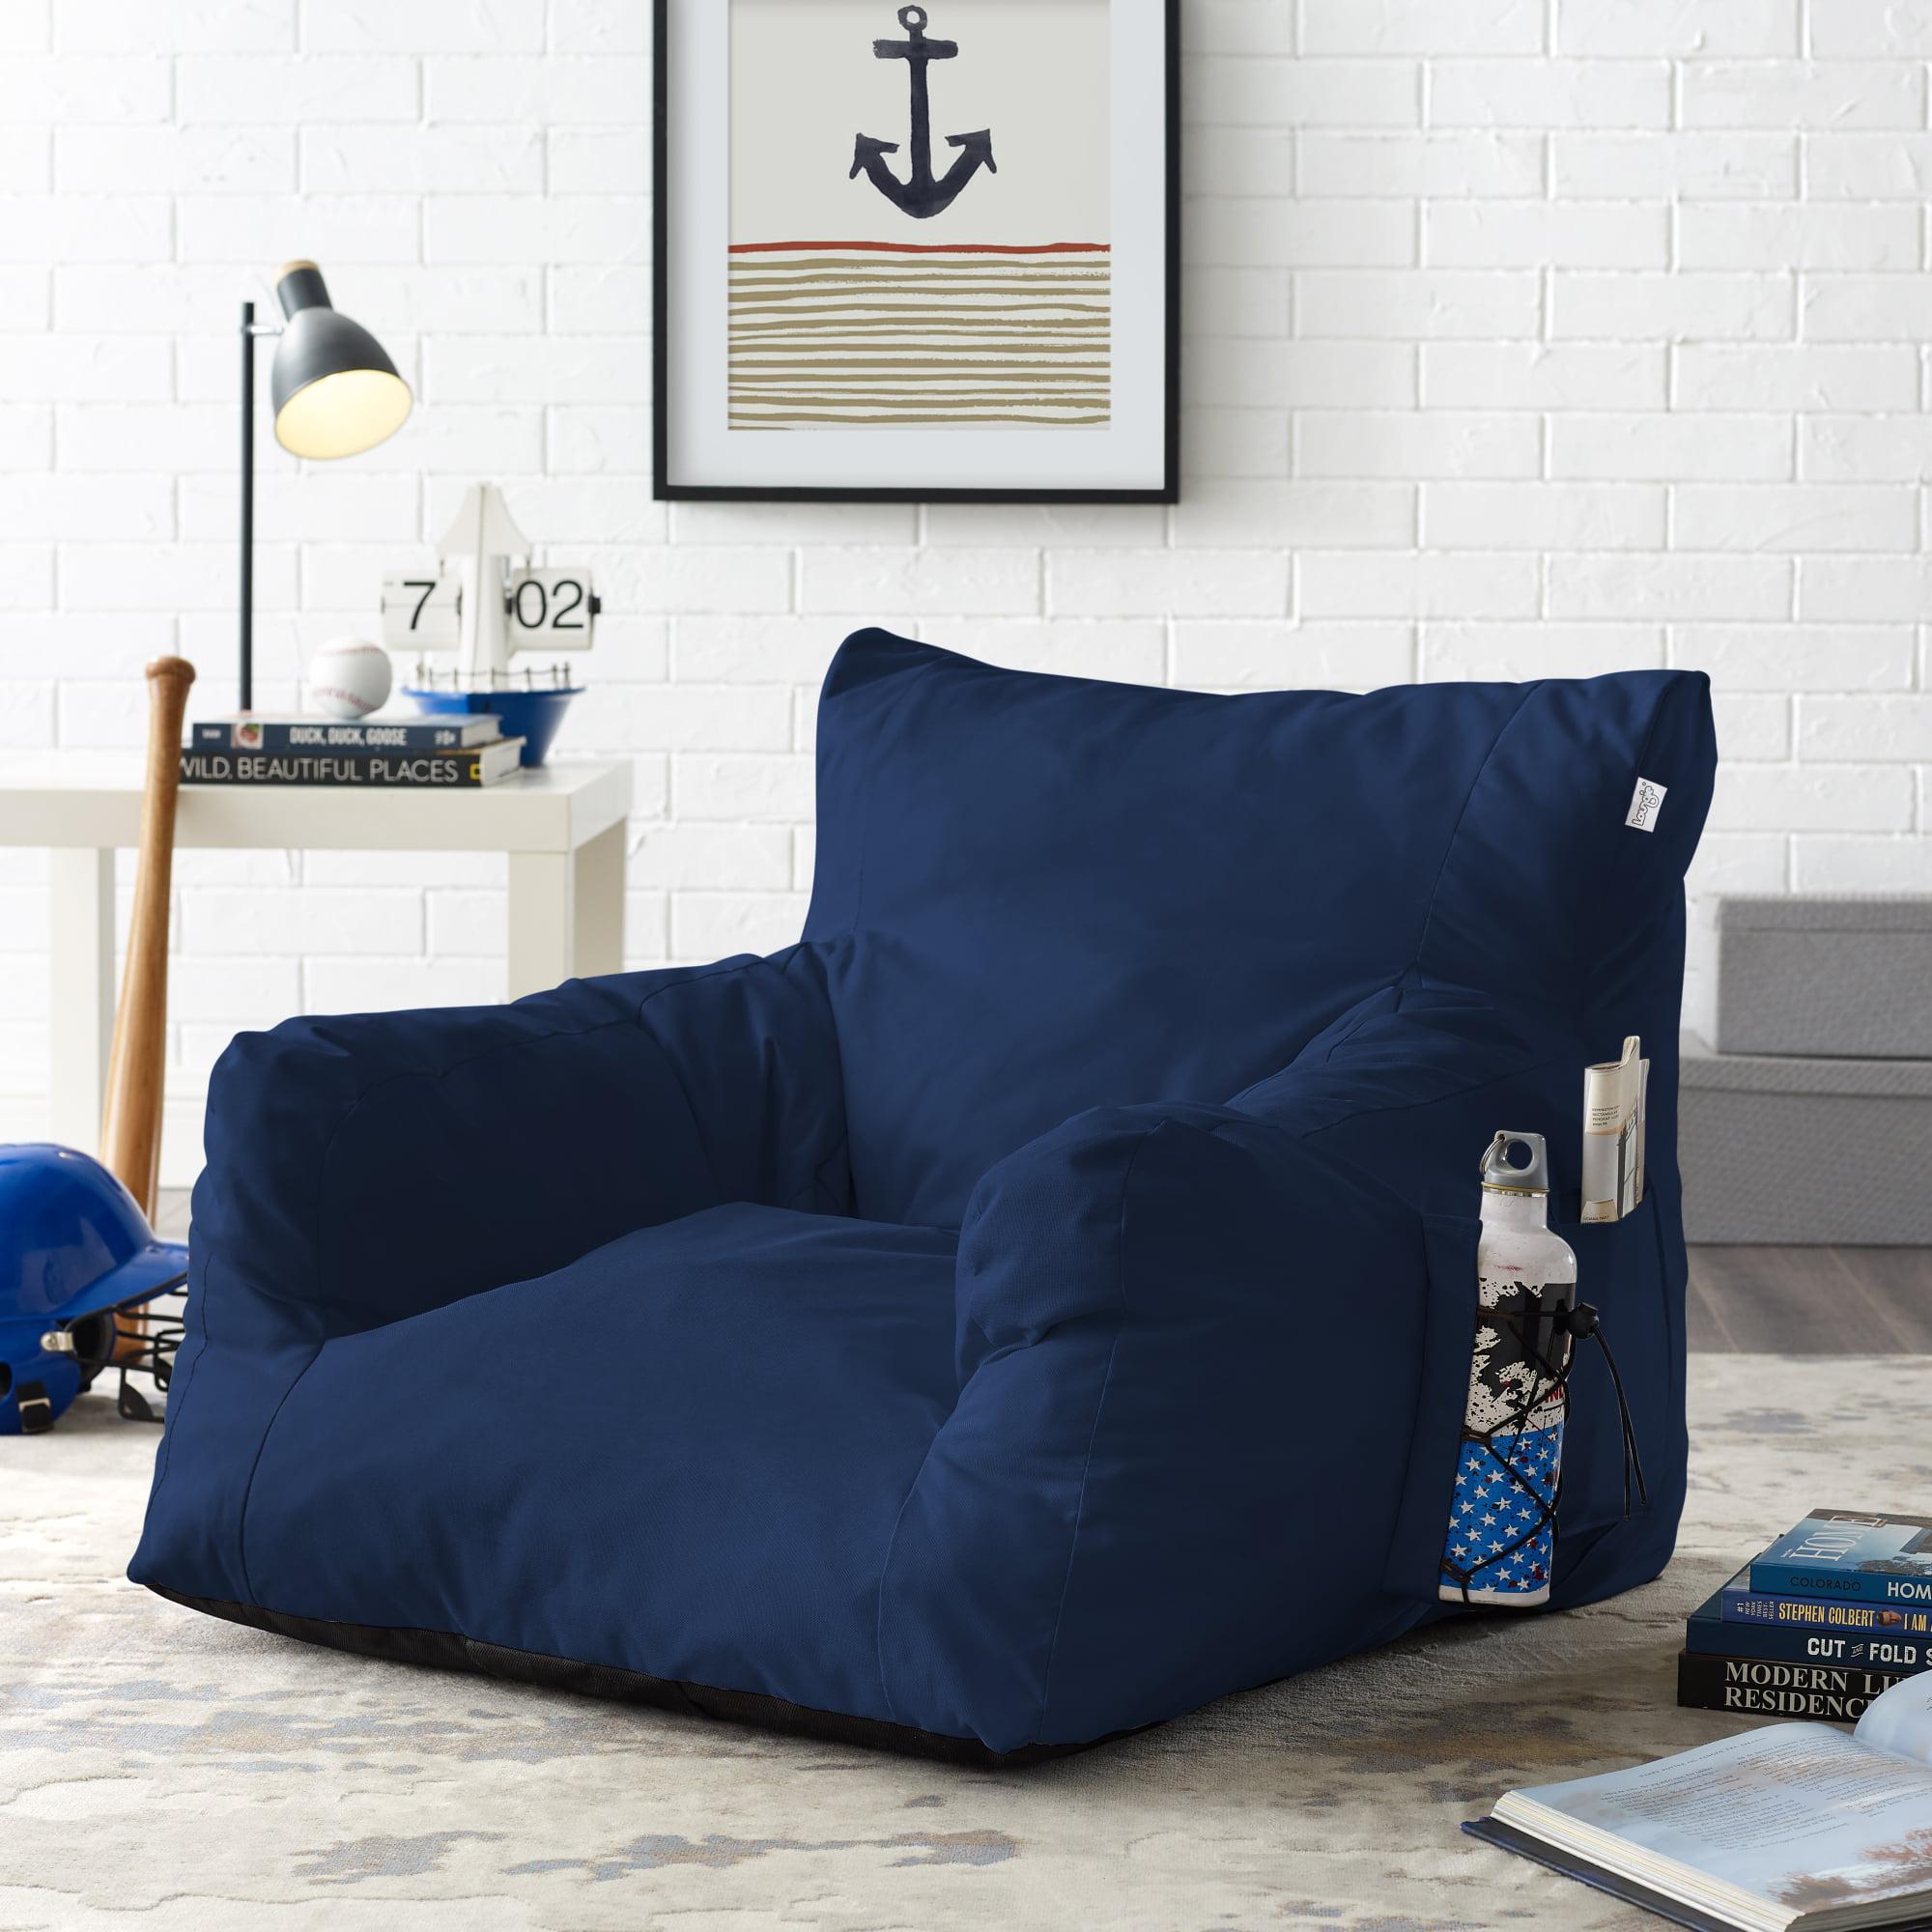 Comfy Grey Foam Lounge Chair - Nylon   Indoor/ Outdoor   Self Expanding   Water Resistant   Bean Bag Chair